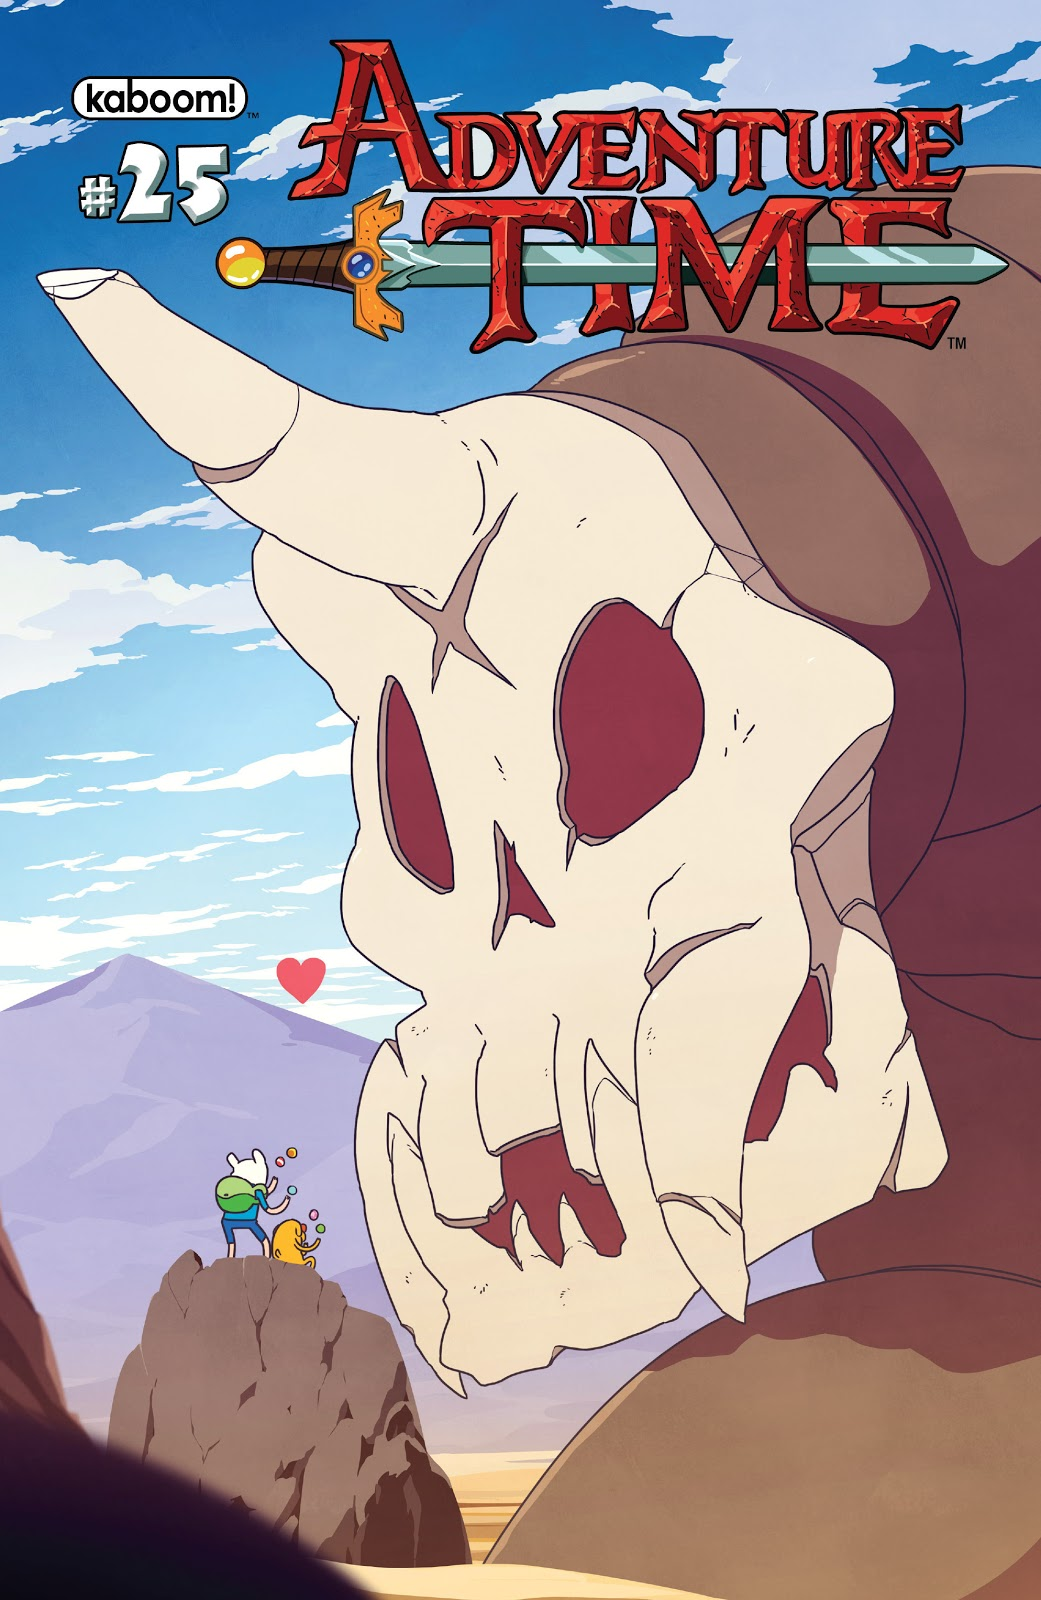 File:Kaboom adventure time 025 a.jpg